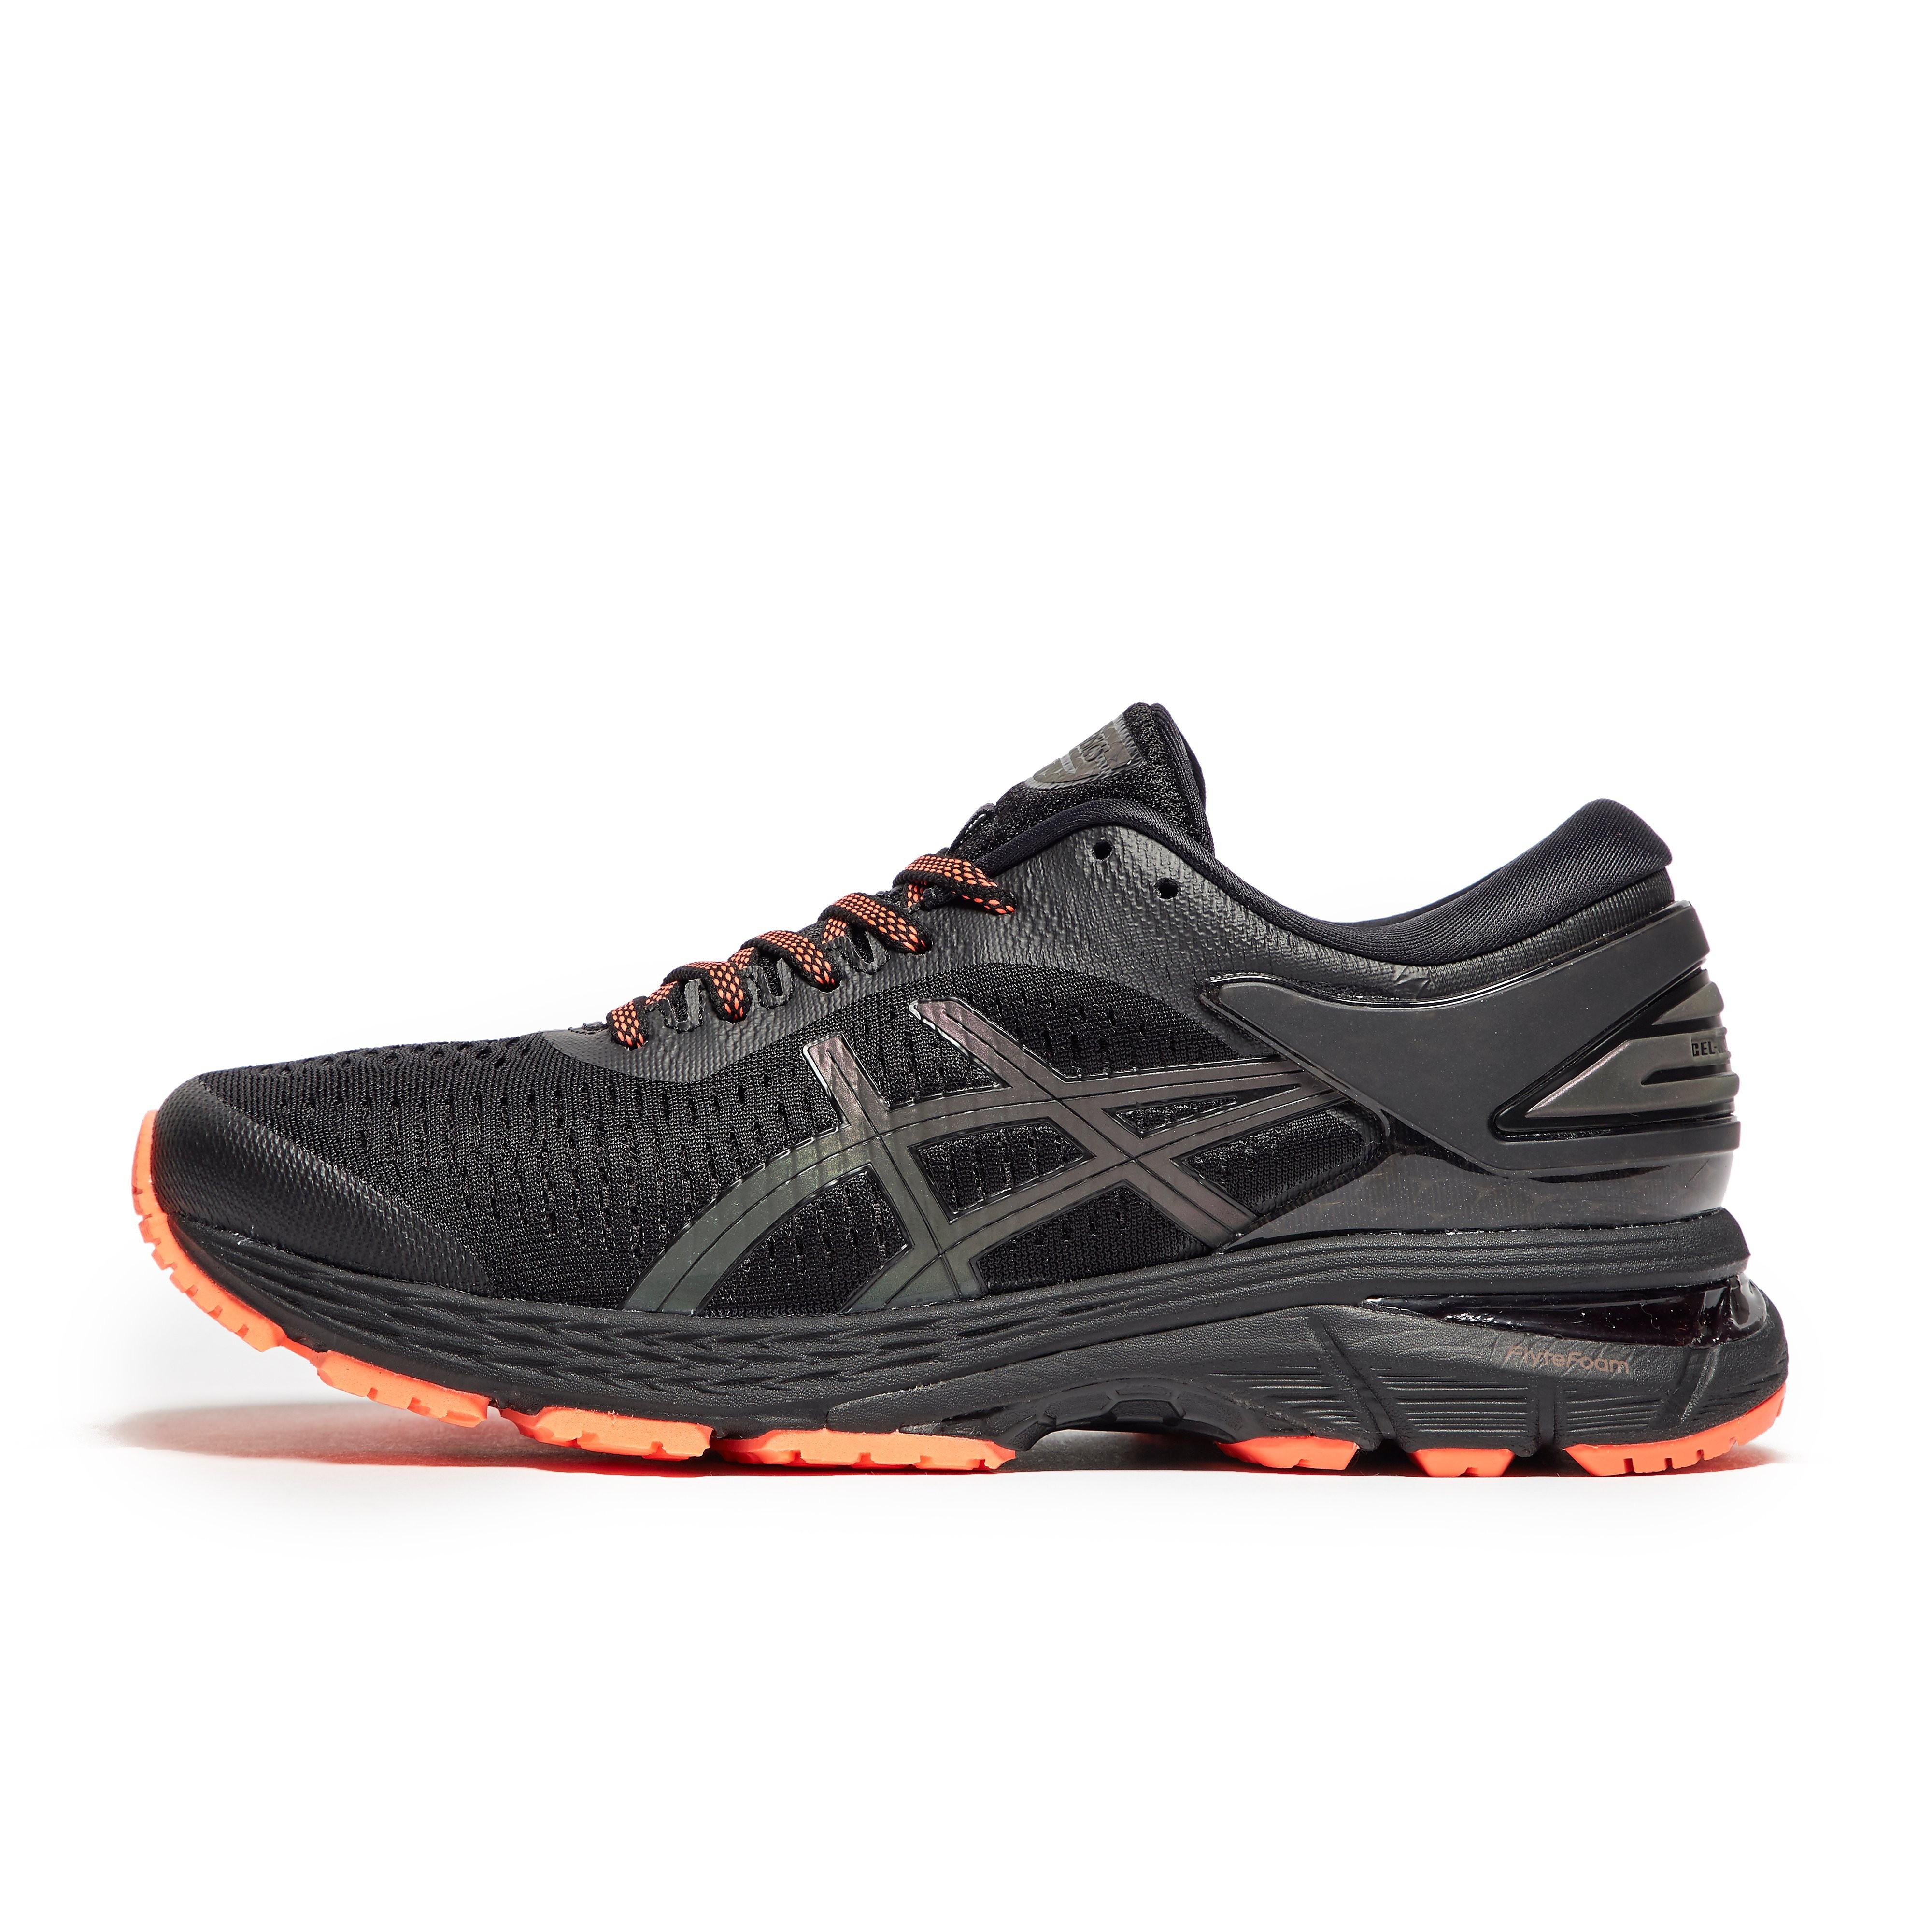 Womens Black ASICS Gel-Kayano 25 Lite-Show Running Shoes